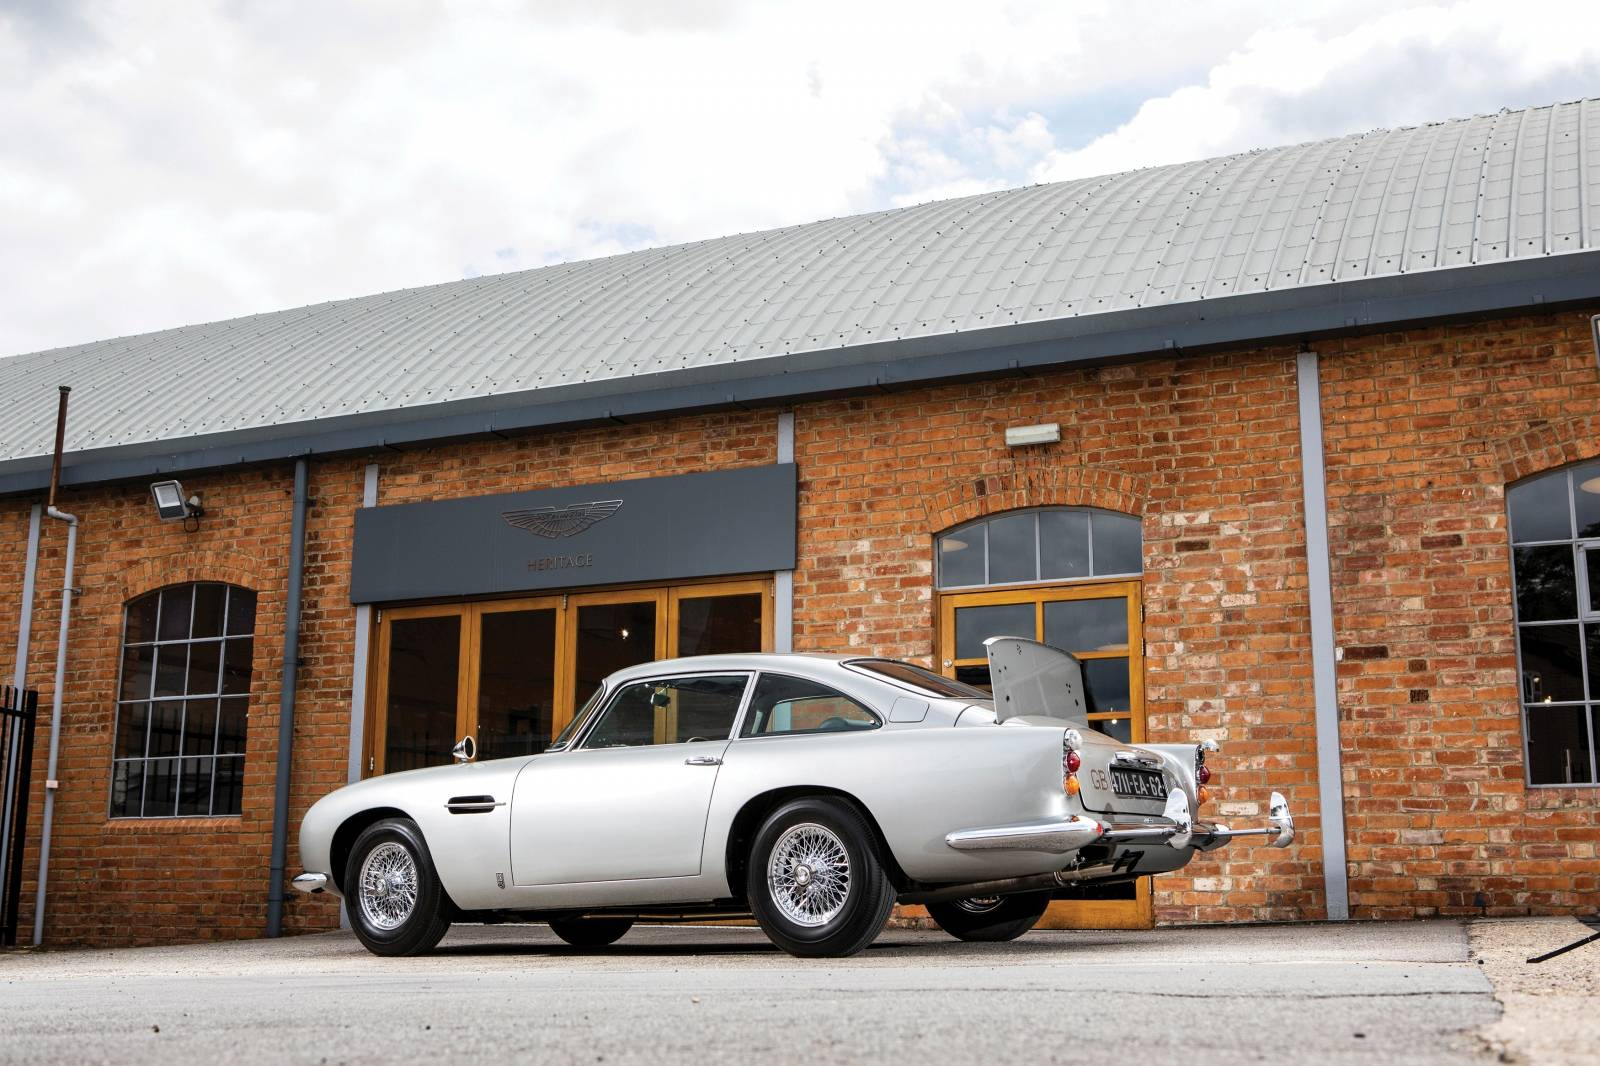 Handout photo of an original Aston Martin DB5 James Bond car